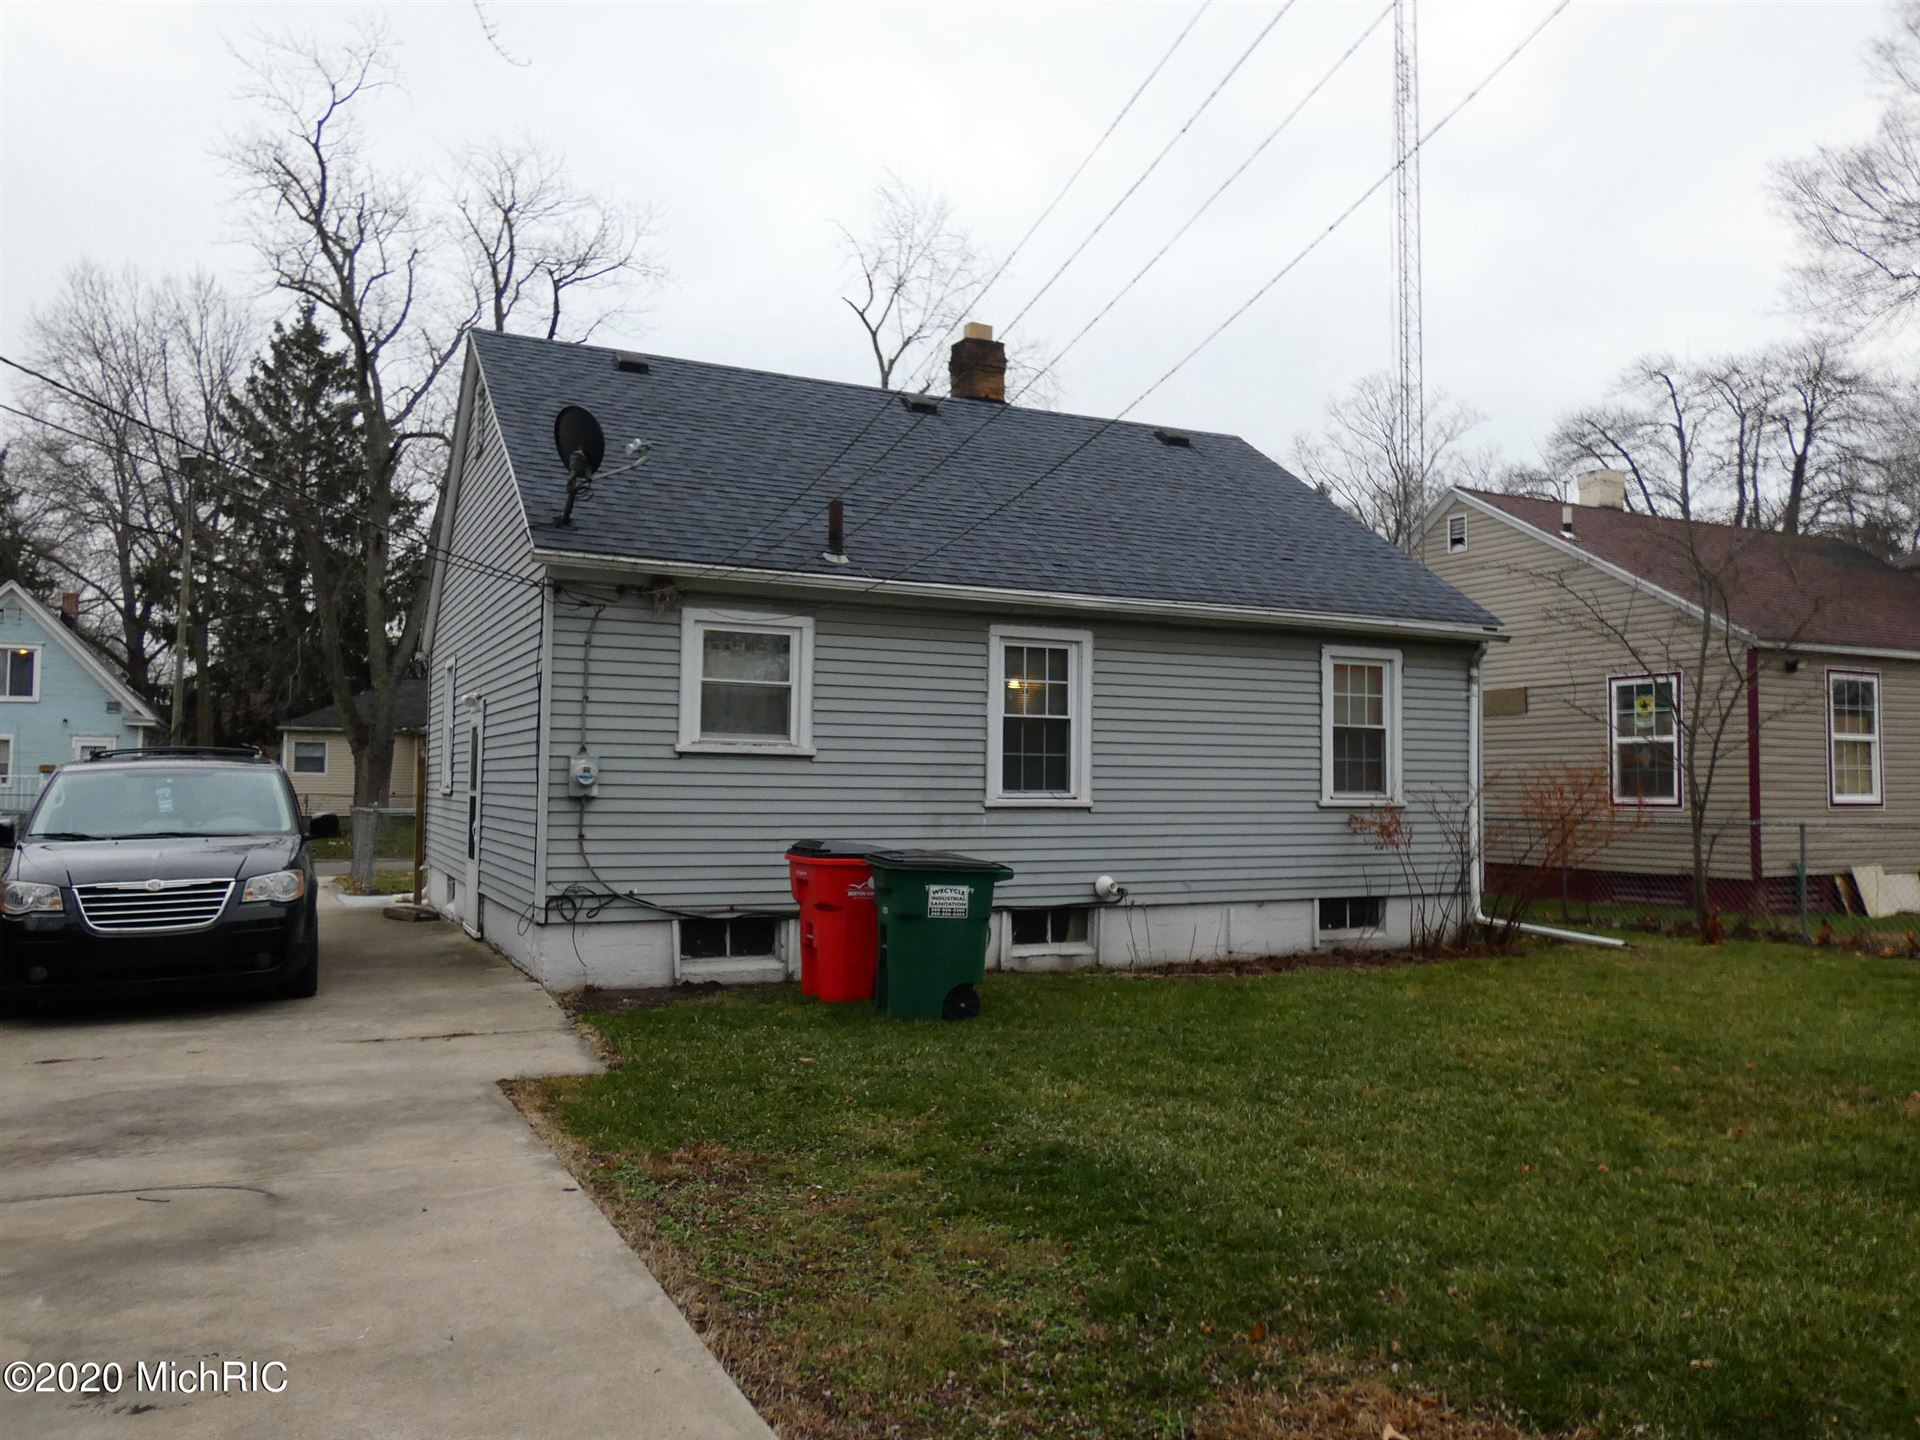 986 Lavette Avenue, Benton Harbor, MI 49022 - MLS#: 20051964